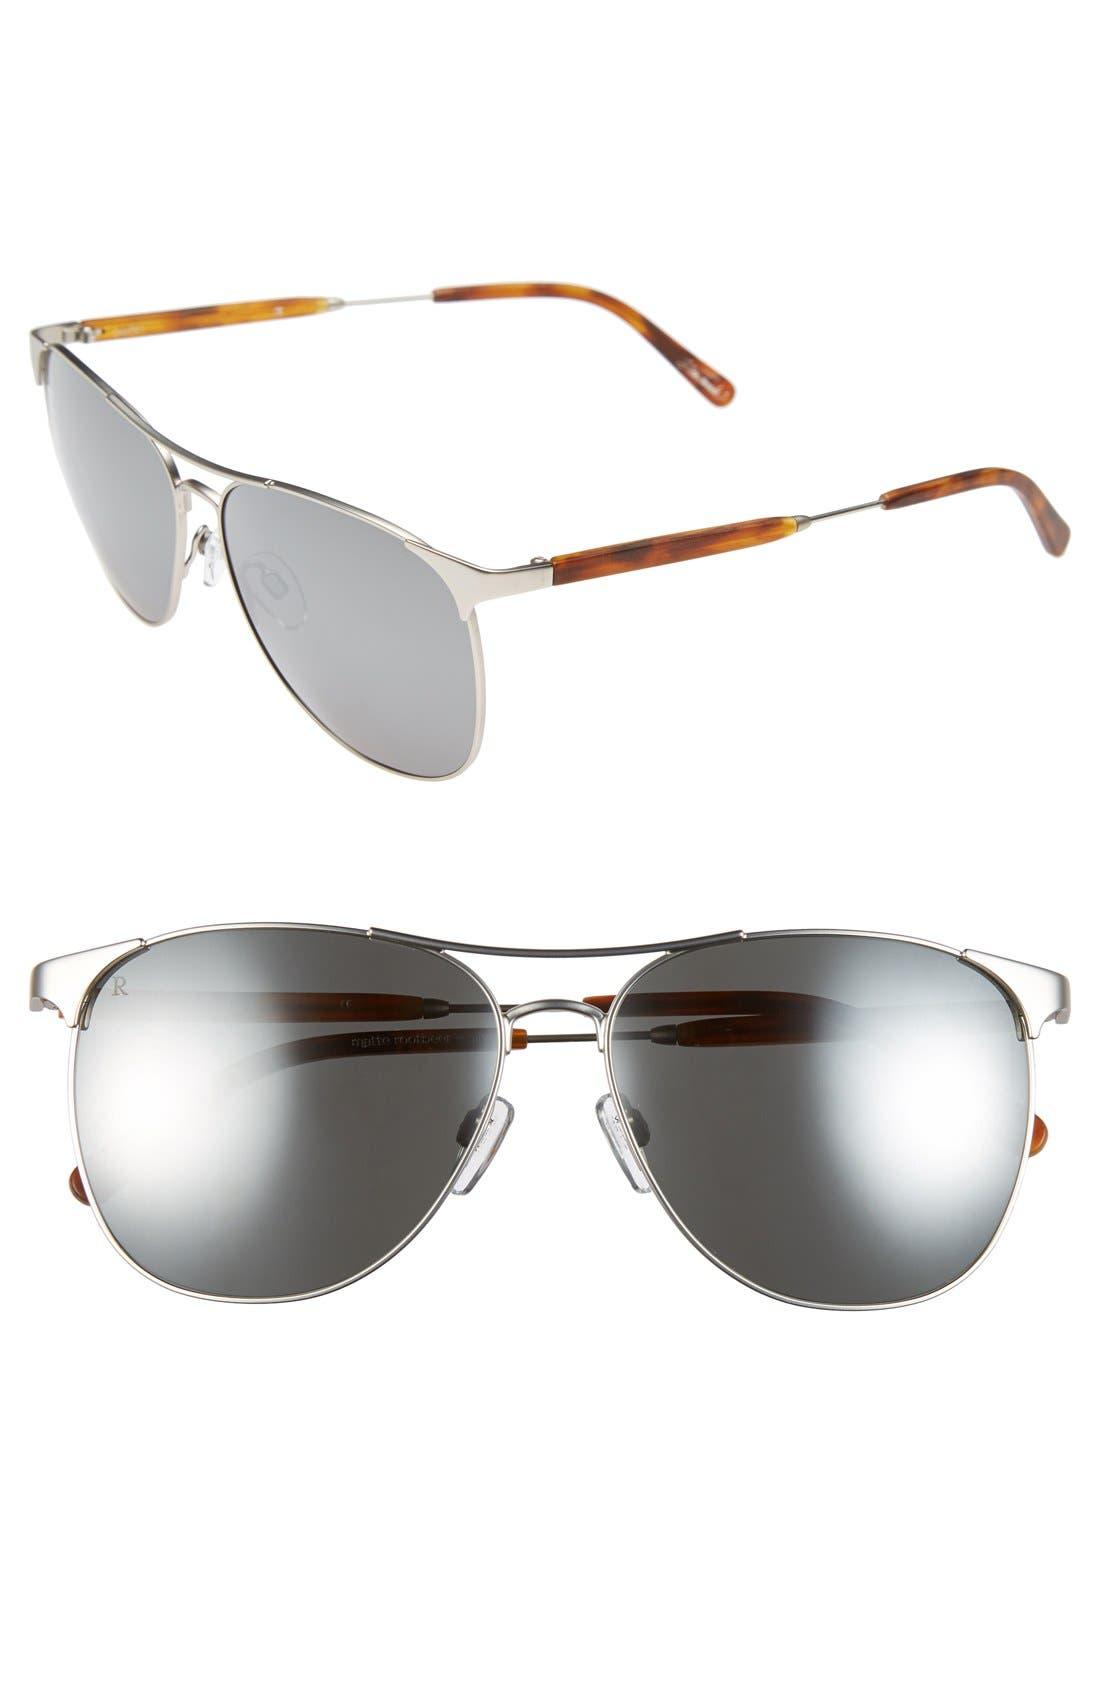 Main Image - RAEN 'Castor' 58mm Sunglasses